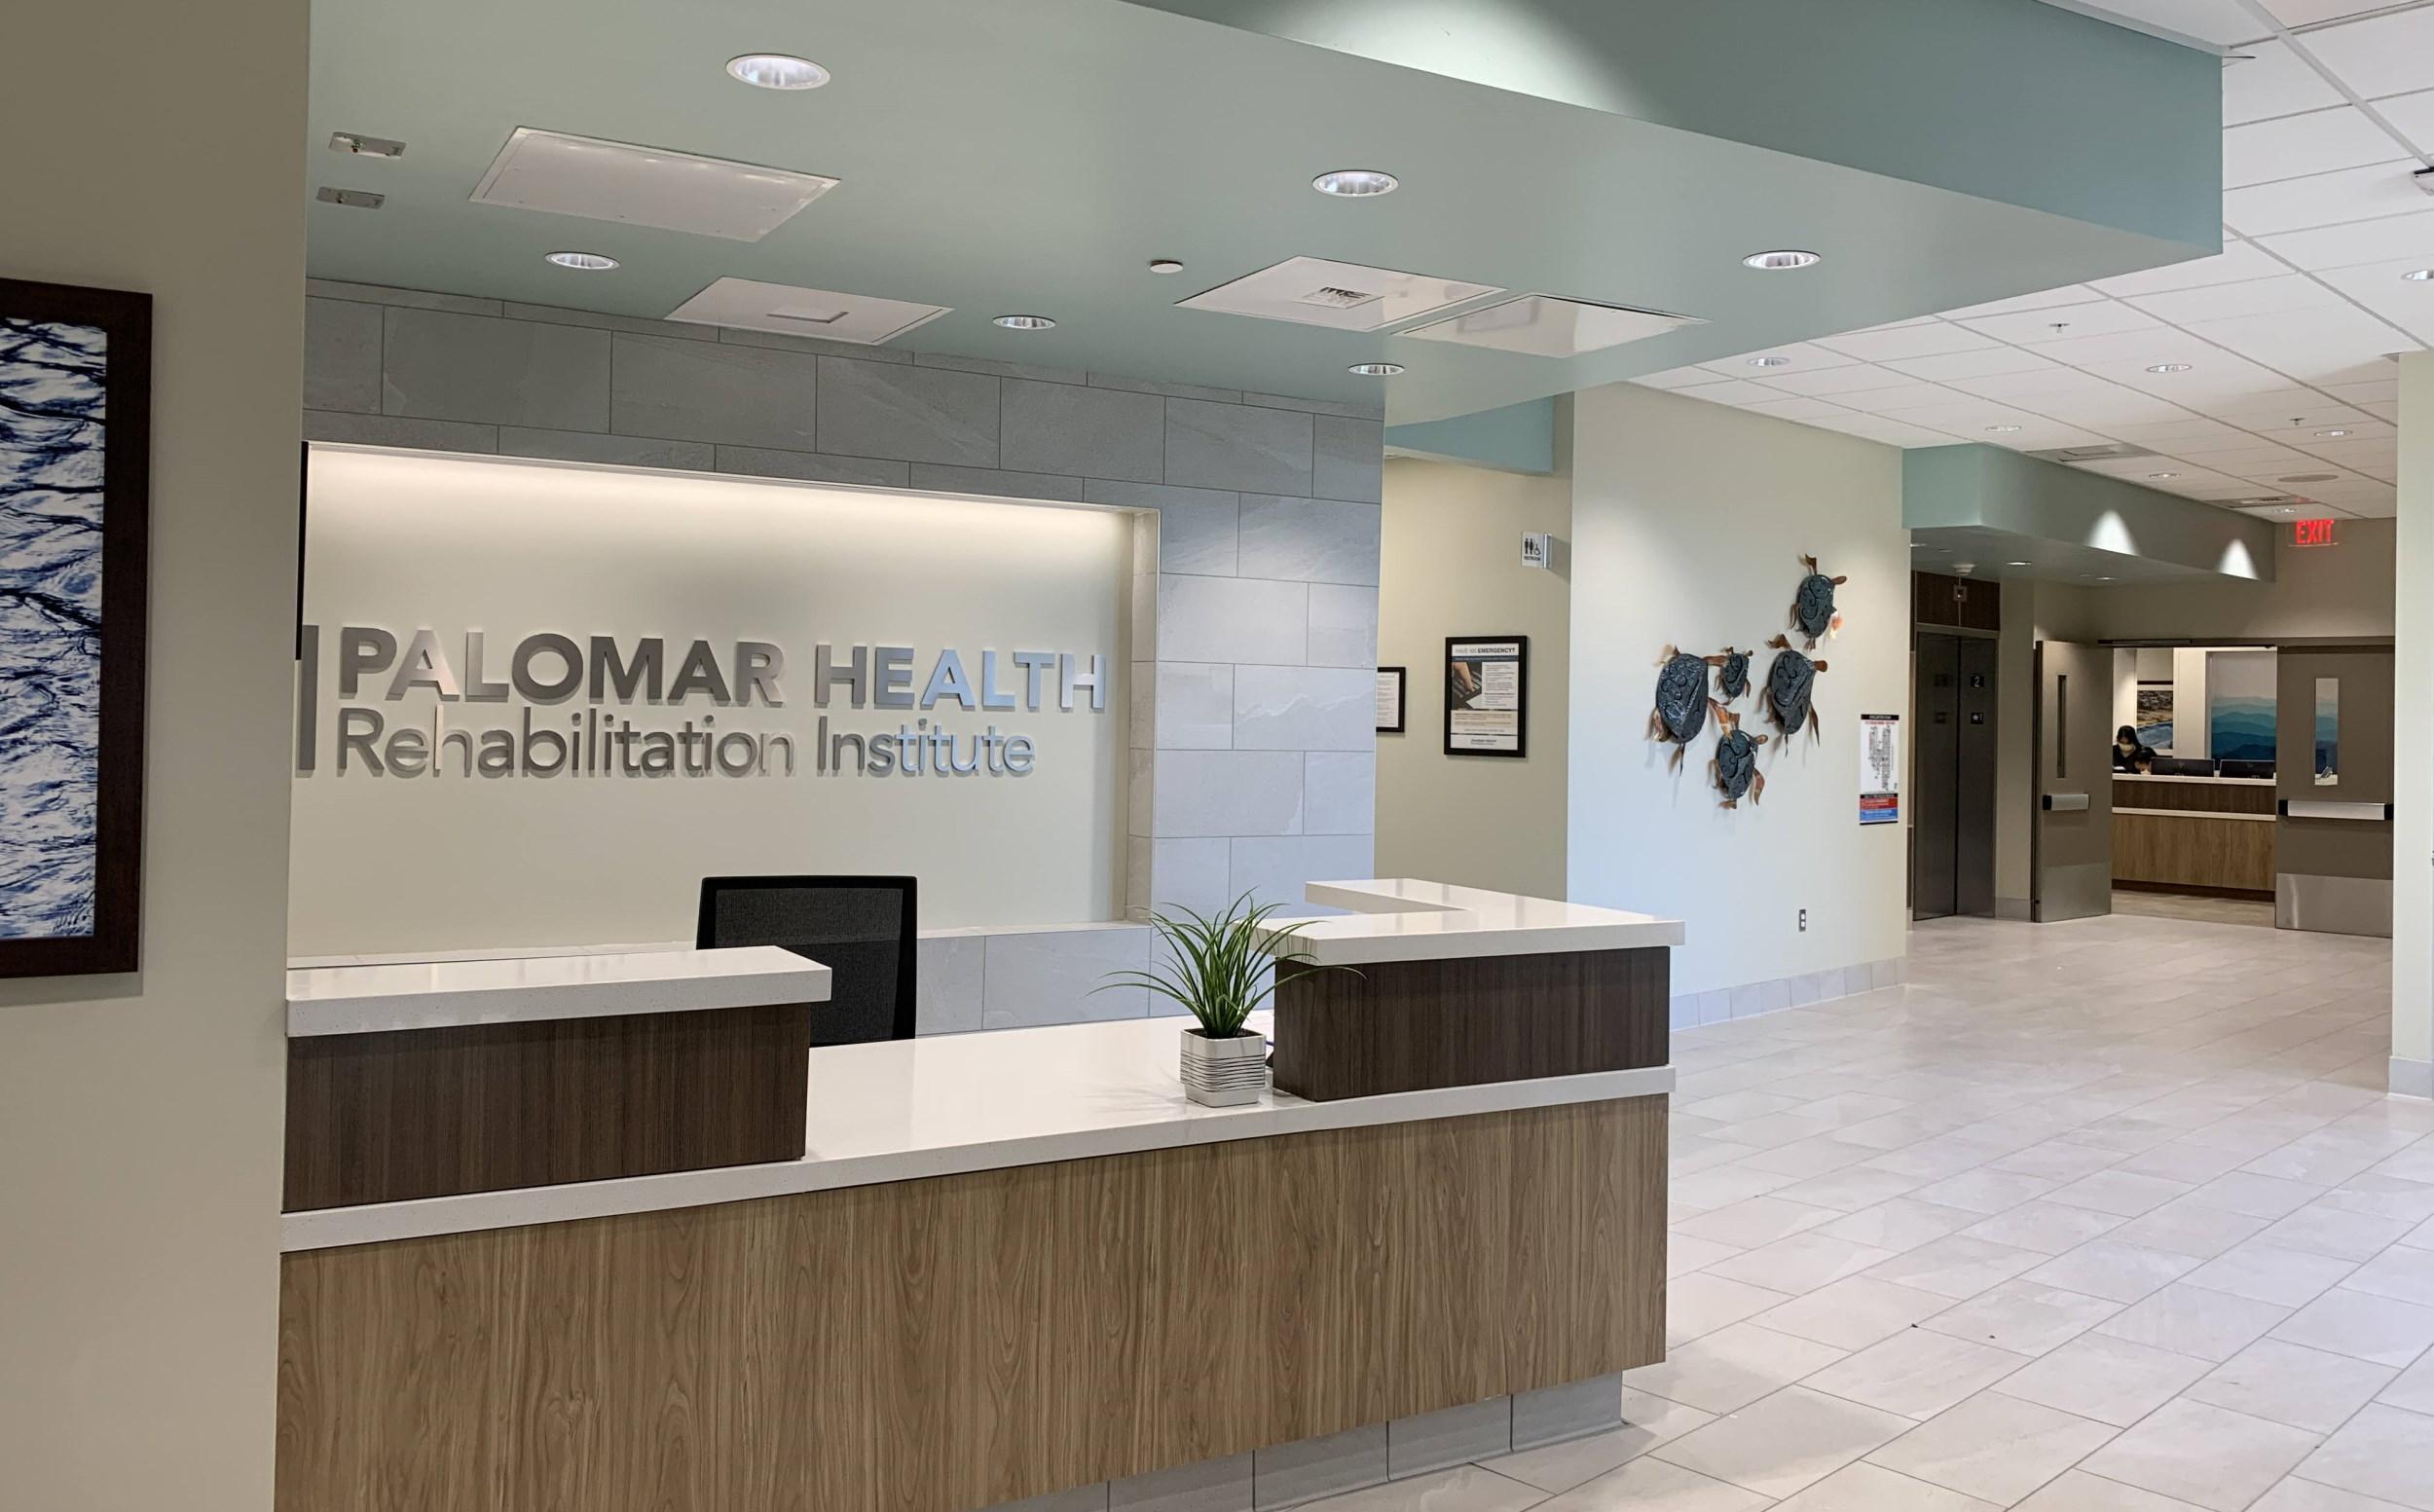 Palomar Health Rehabilitation Institute